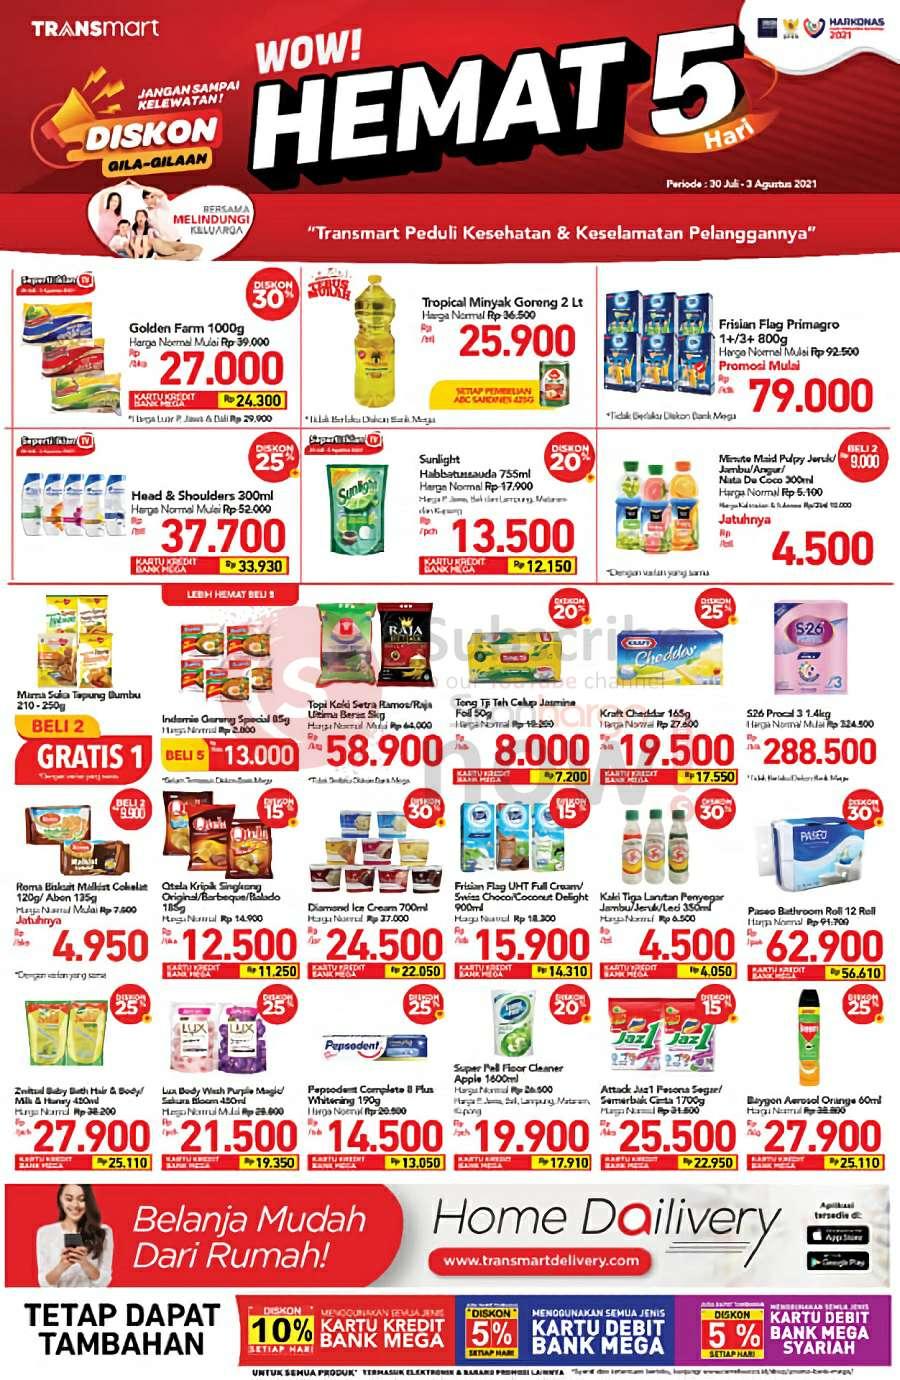 Katalog Promo JSM Carrefour Transmart Weekend 30 Juli - 3 Agustus 2021